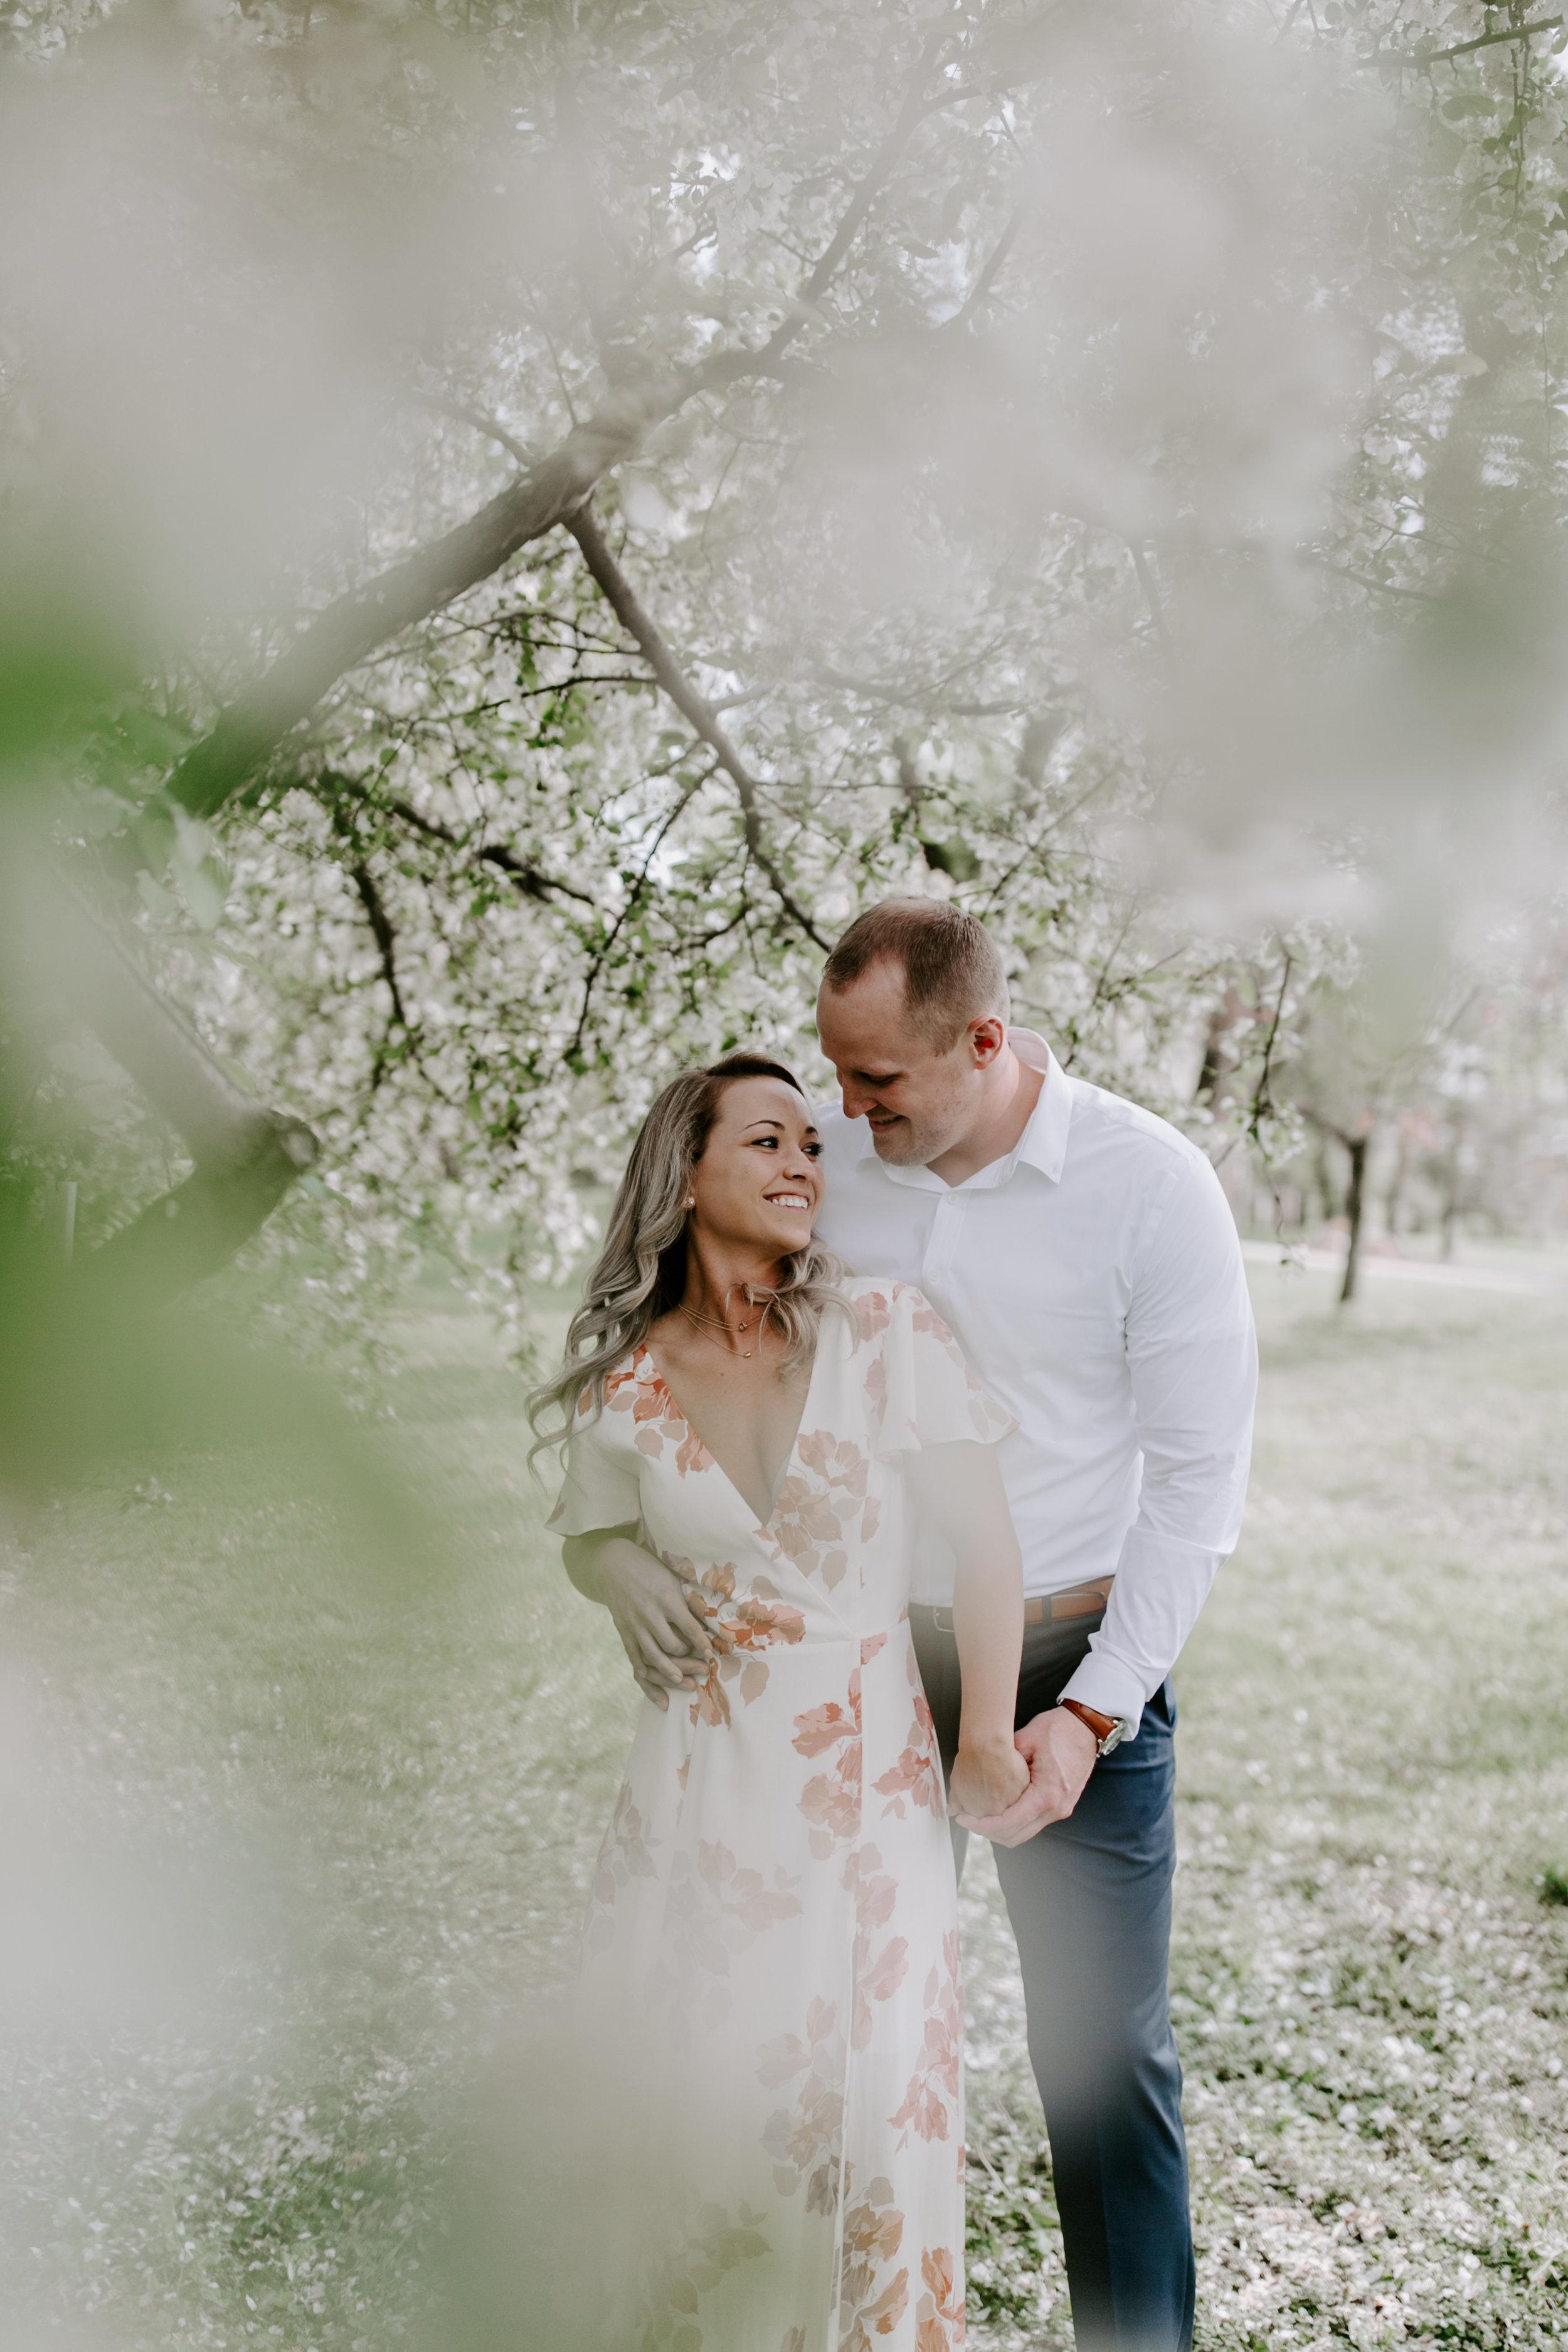 gracetphotography-wedding-photographer-adventure-bride-engagement-midwest-5.jpg